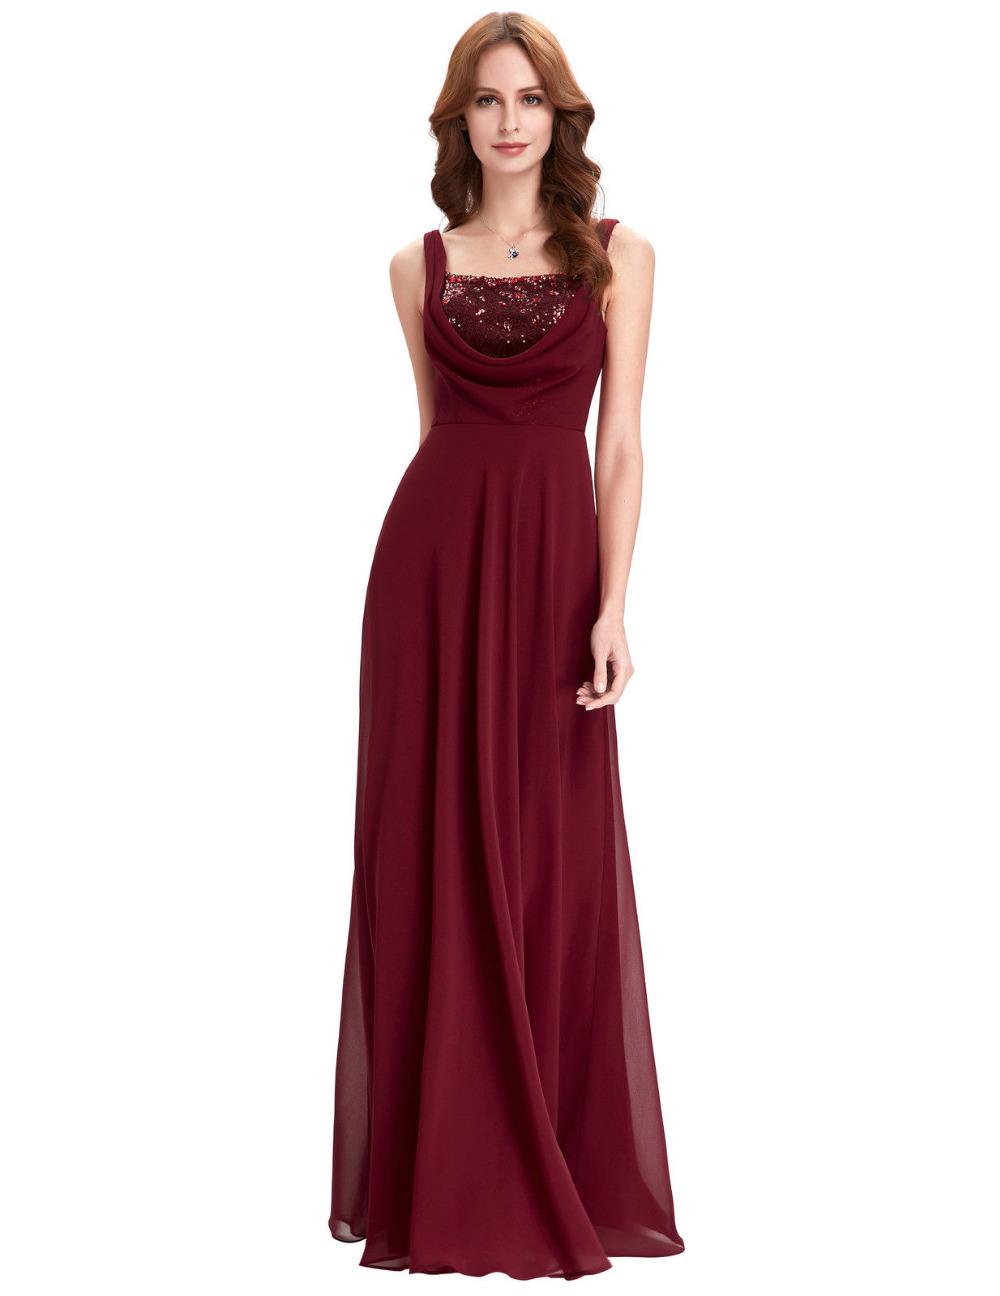 Elegant bridal dress spaghetti strap cheap bridesmaid dresses under 50